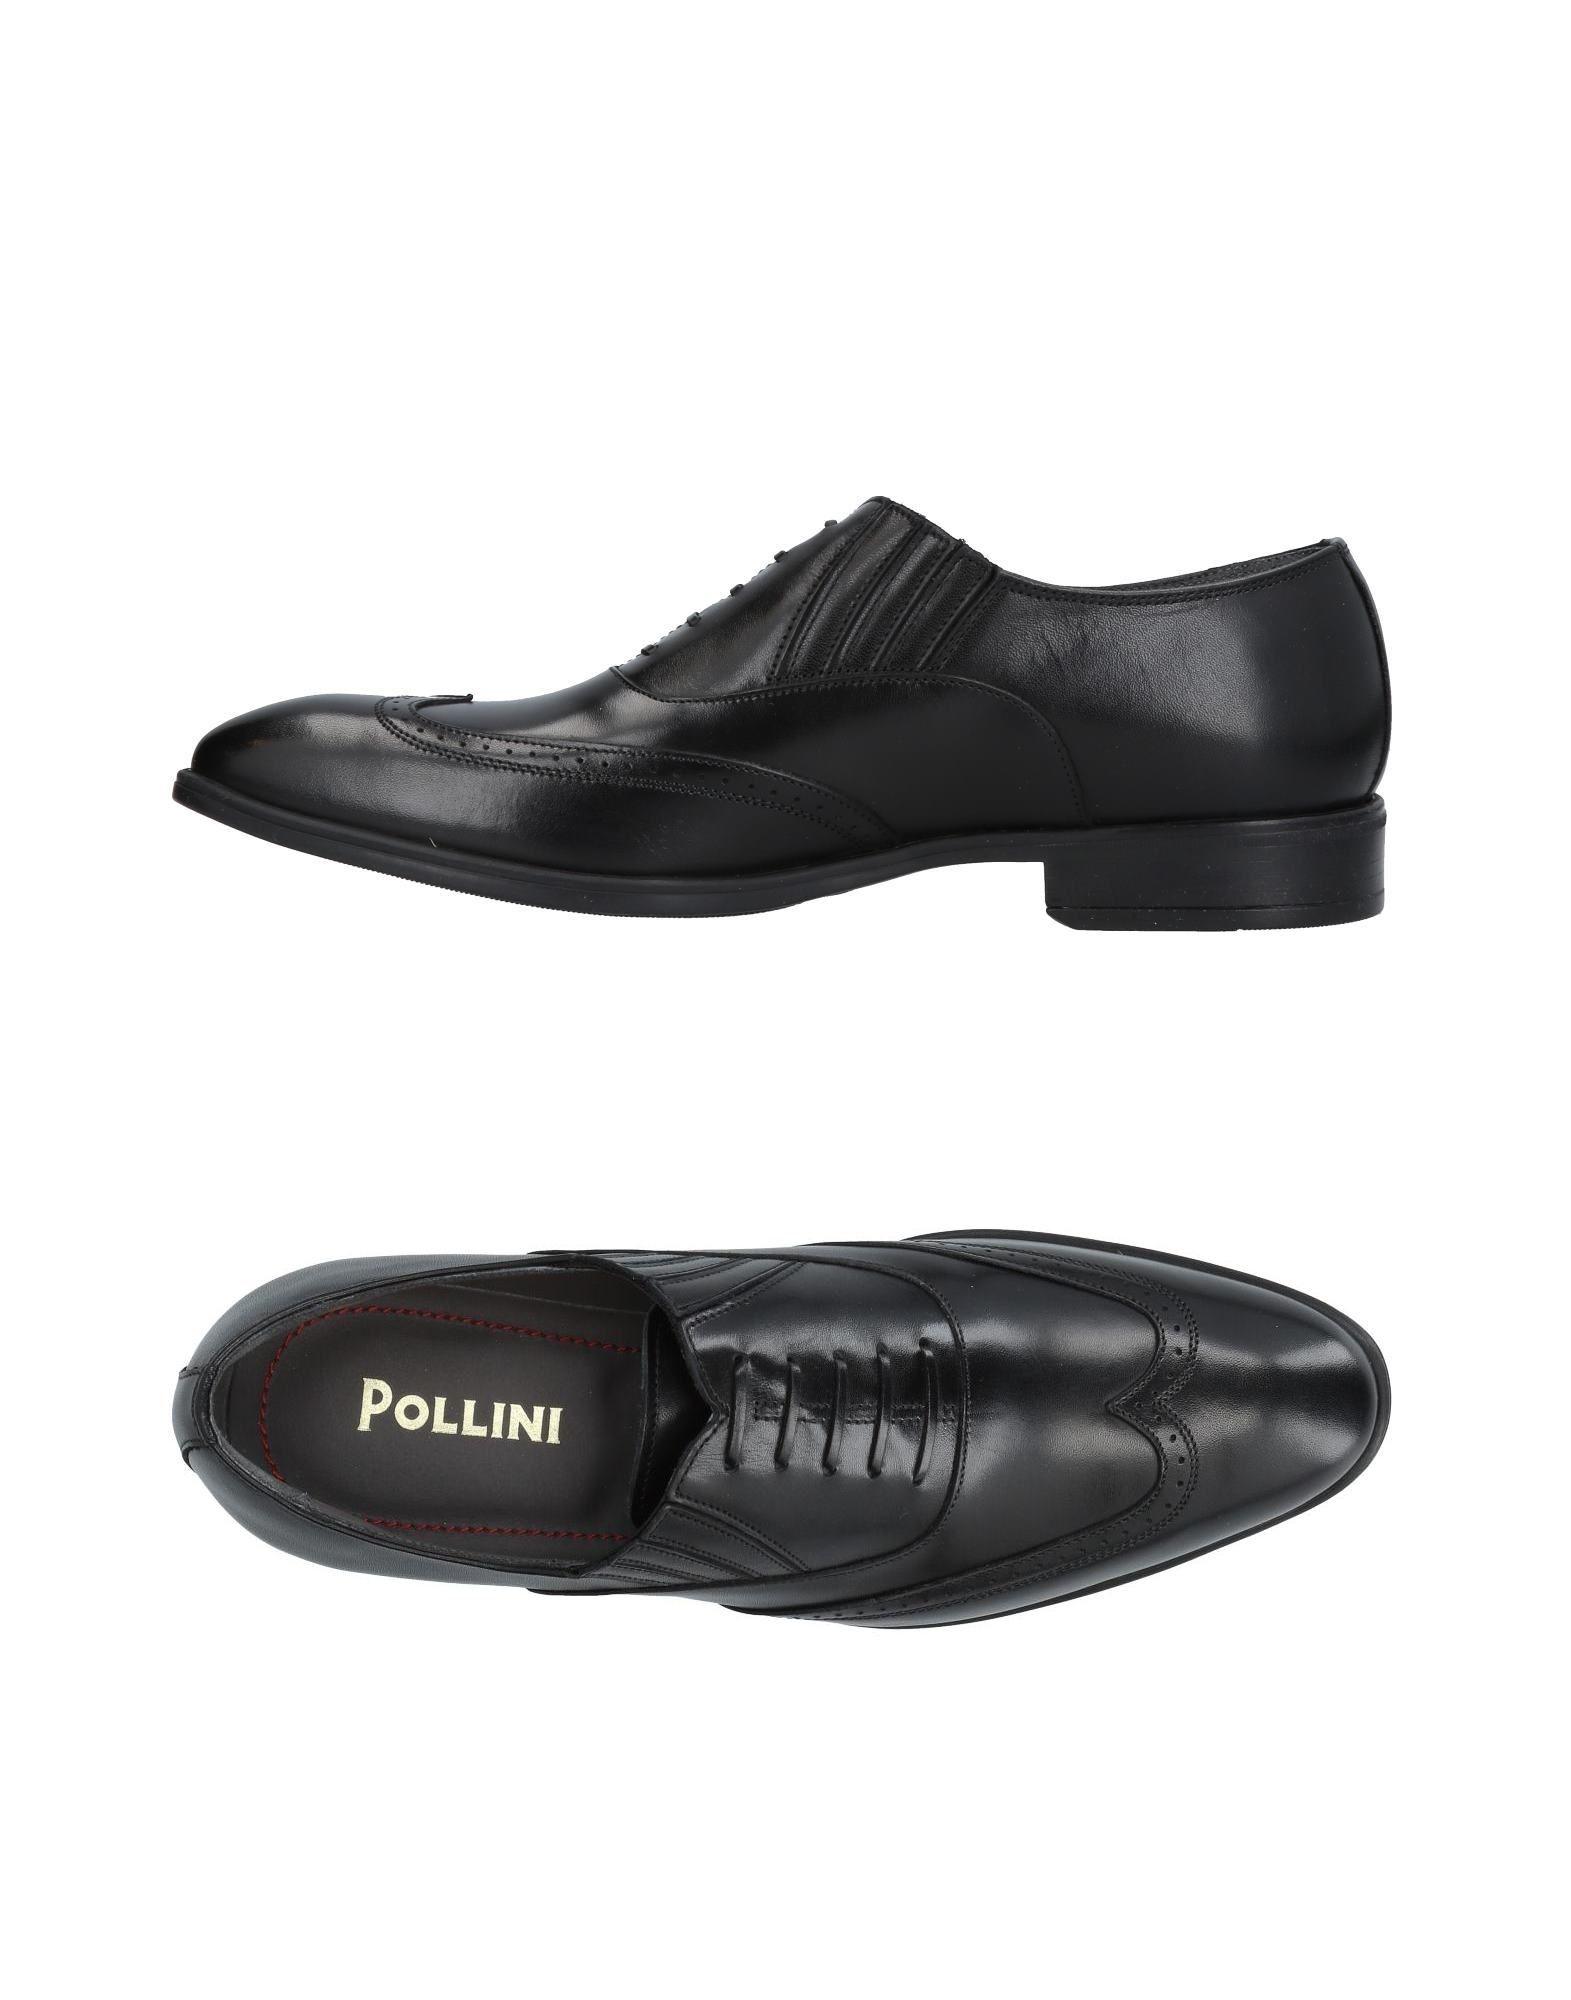 Pollini Loafers - Men Pollini Australia Loafers online on  Australia Pollini - 11447415KH bf7903